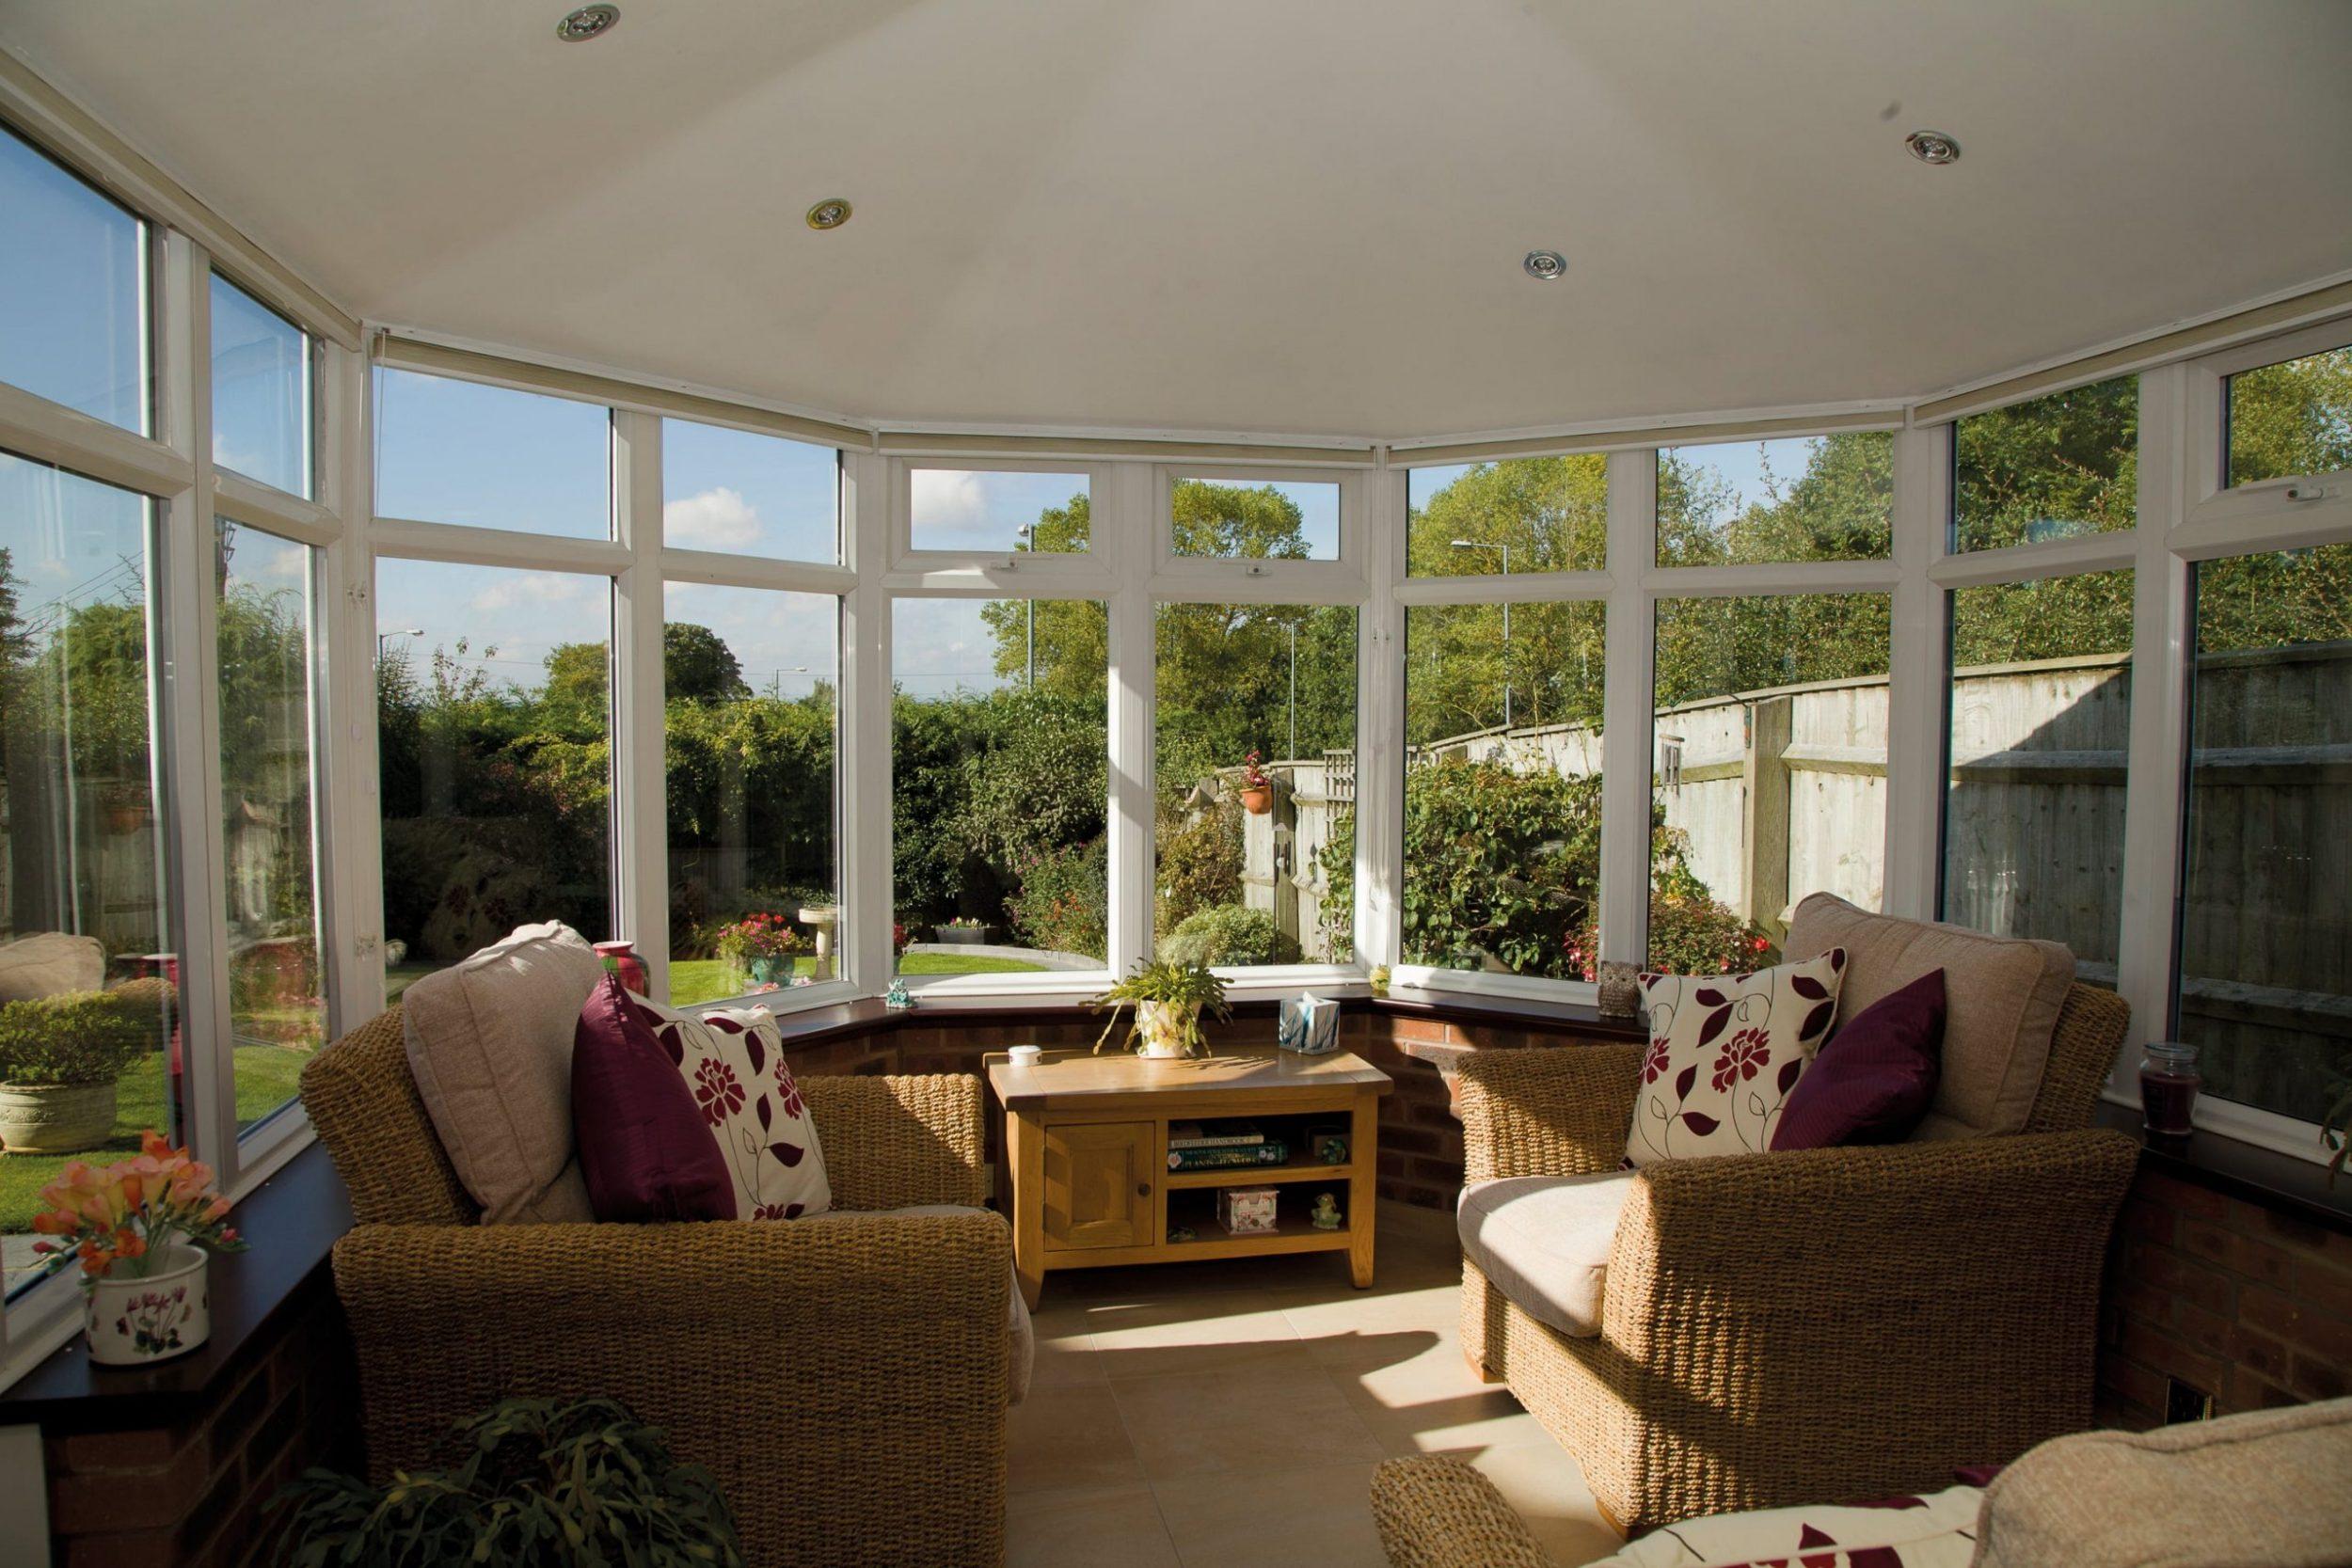 Conservatory, Alan Joy, Dentons Digital, Website Design, Wiltshire, Somerset